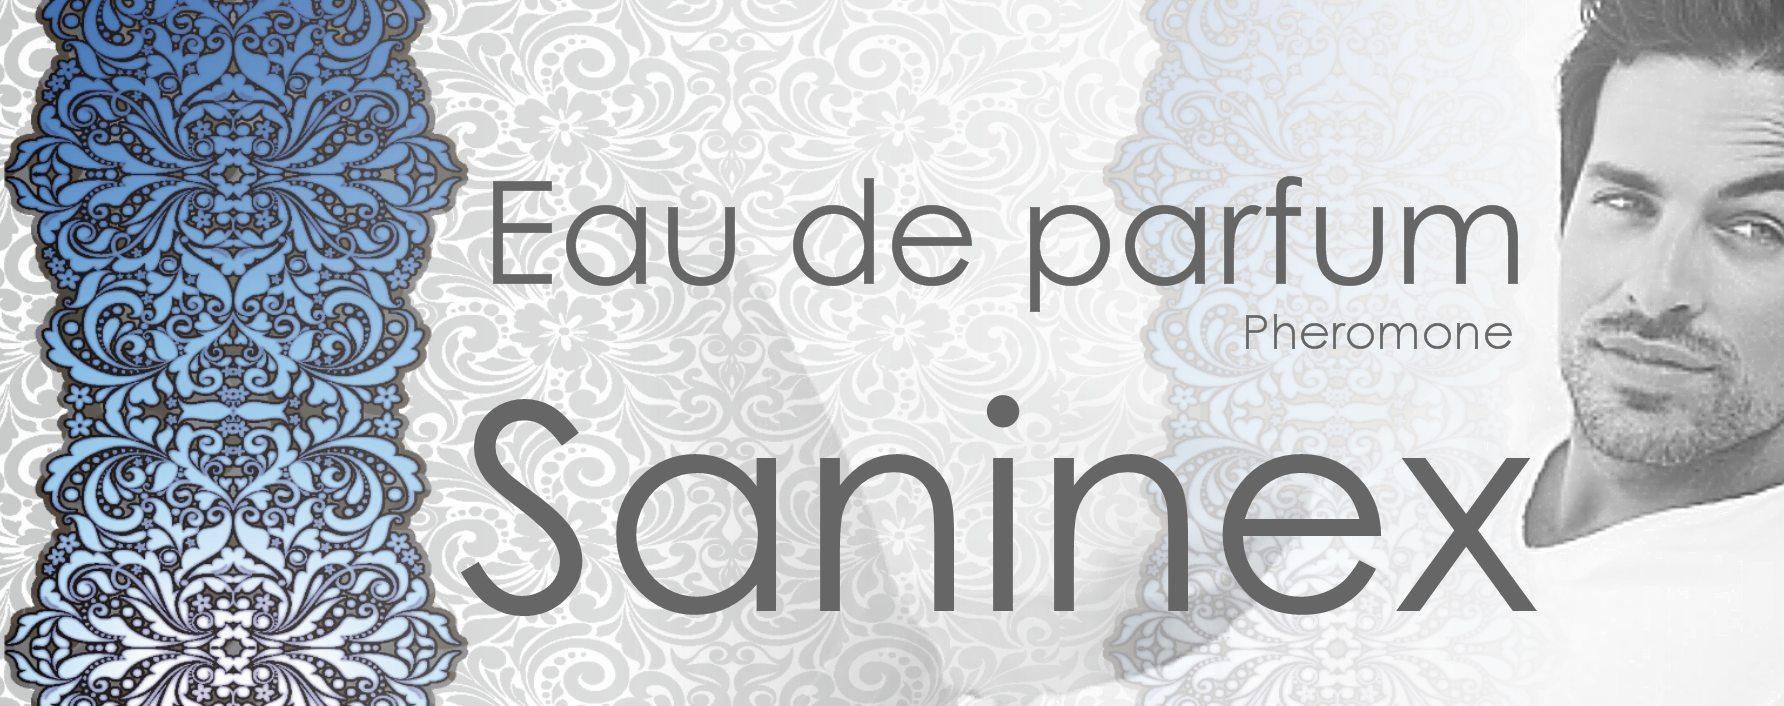 Saninex Eau de parfum aprhodisiac